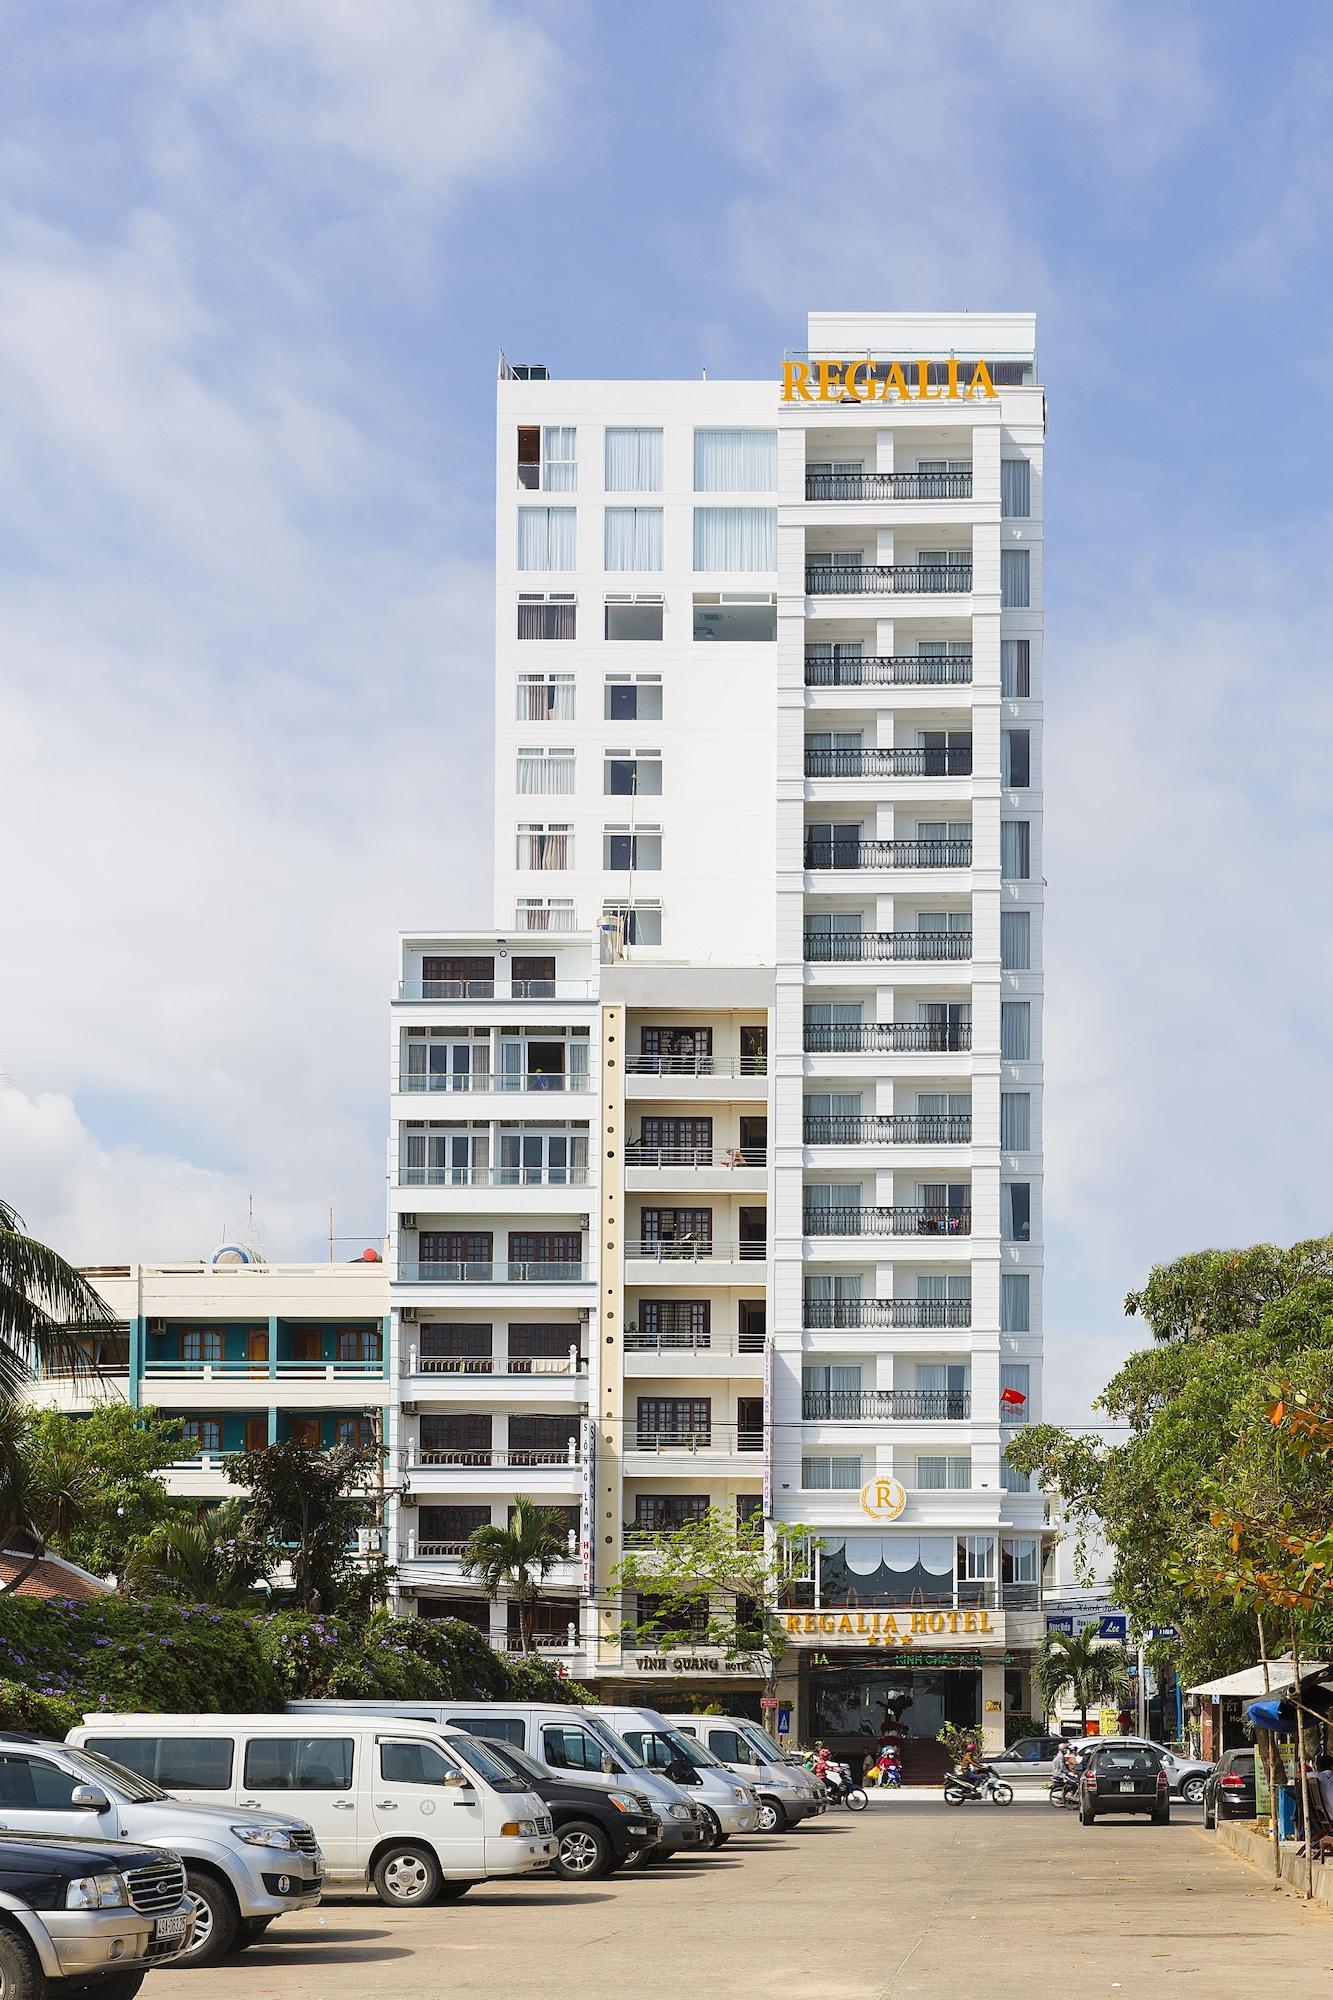 Regalia Hotel, Nha Trang